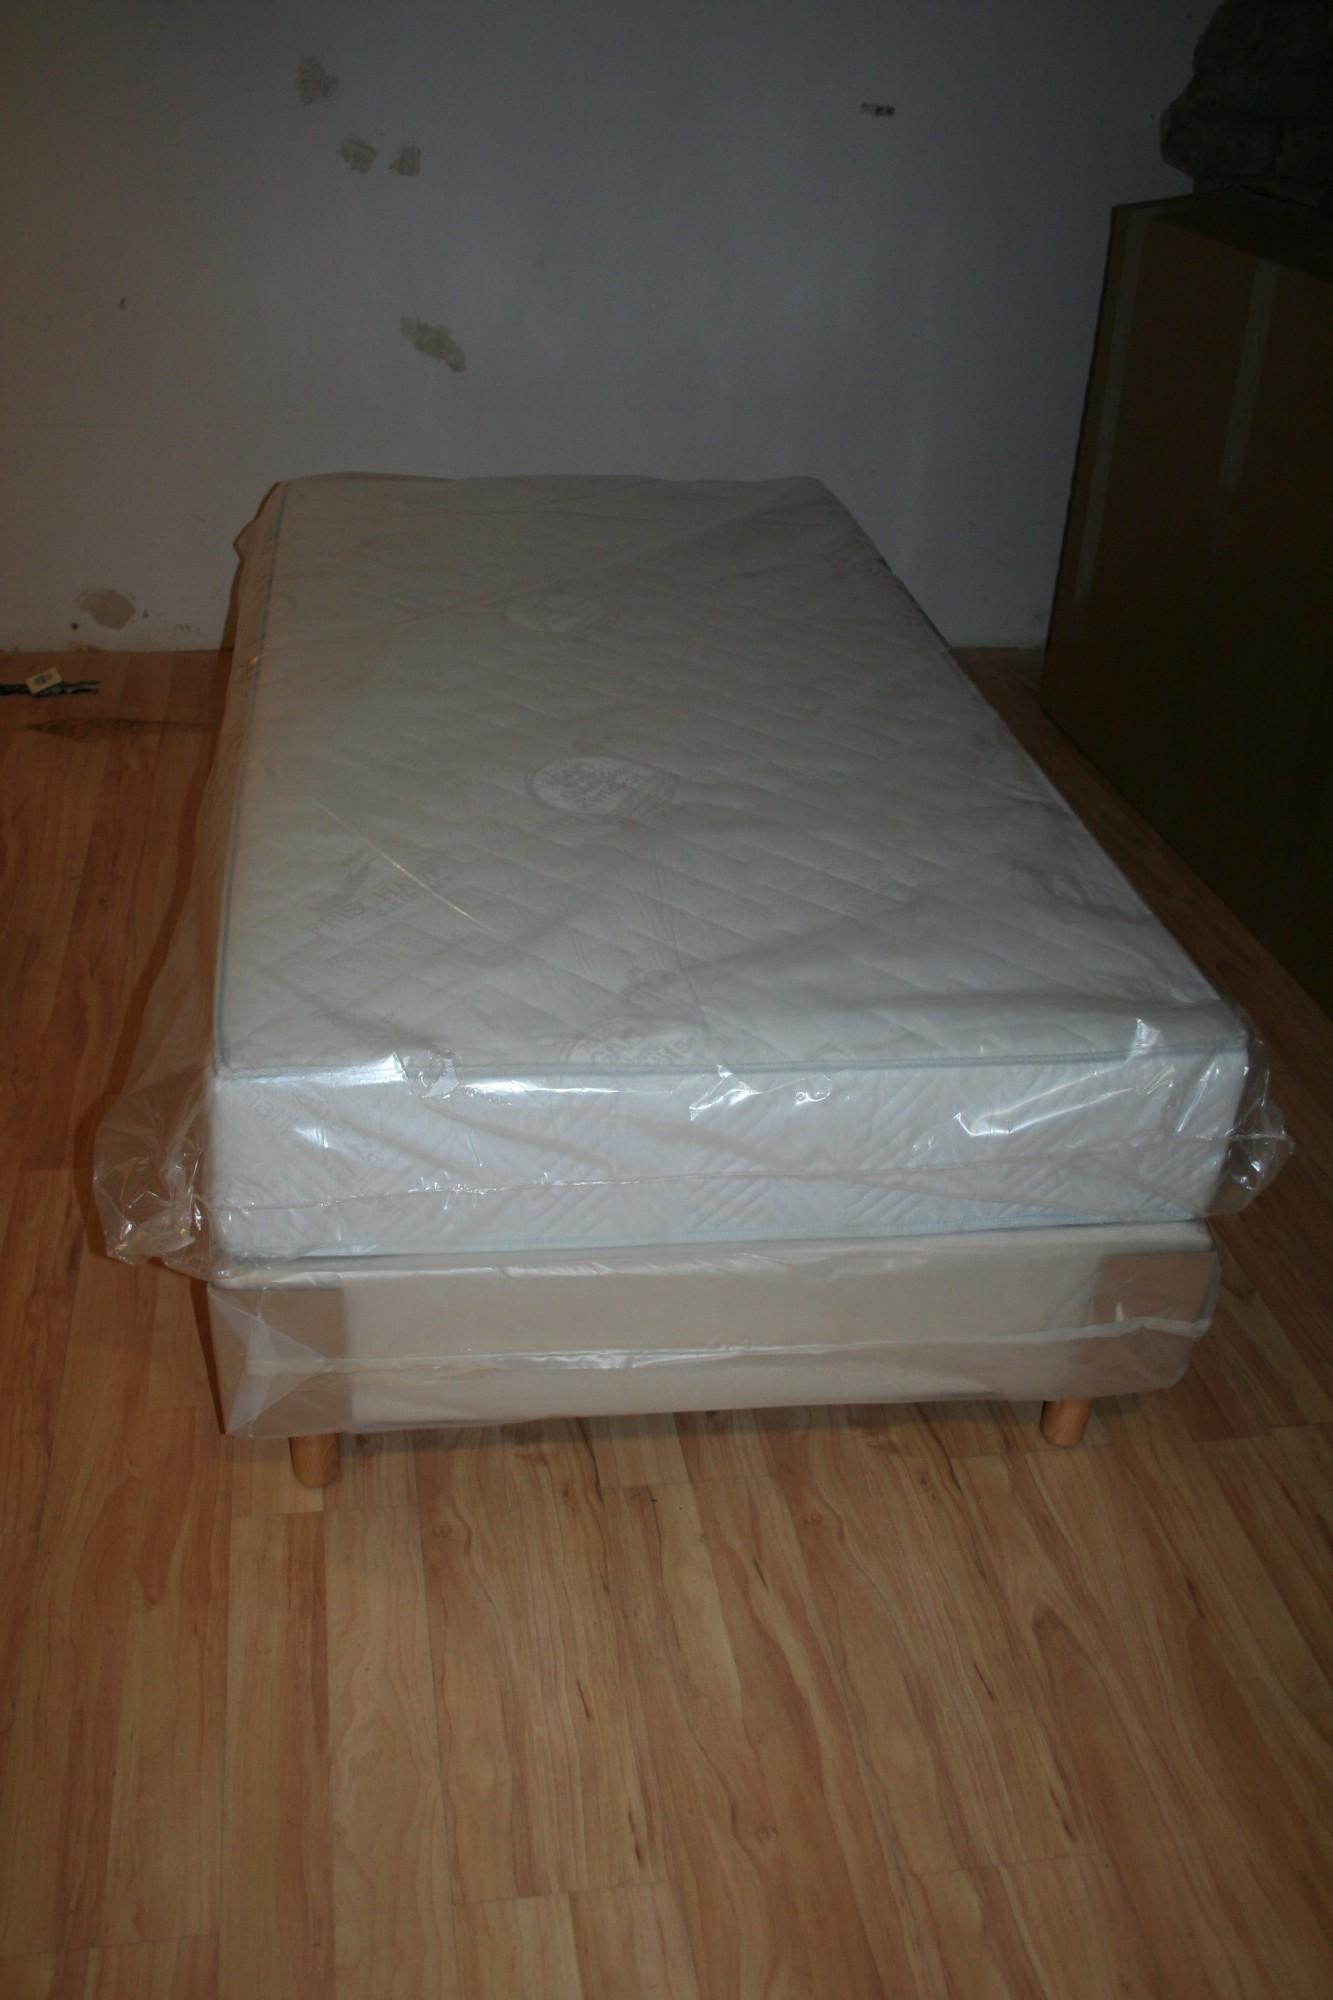 hotelbett boxspringbett 80 90 100 120 x 200cm bett incl matratze topper hotel. Black Bedroom Furniture Sets. Home Design Ideas